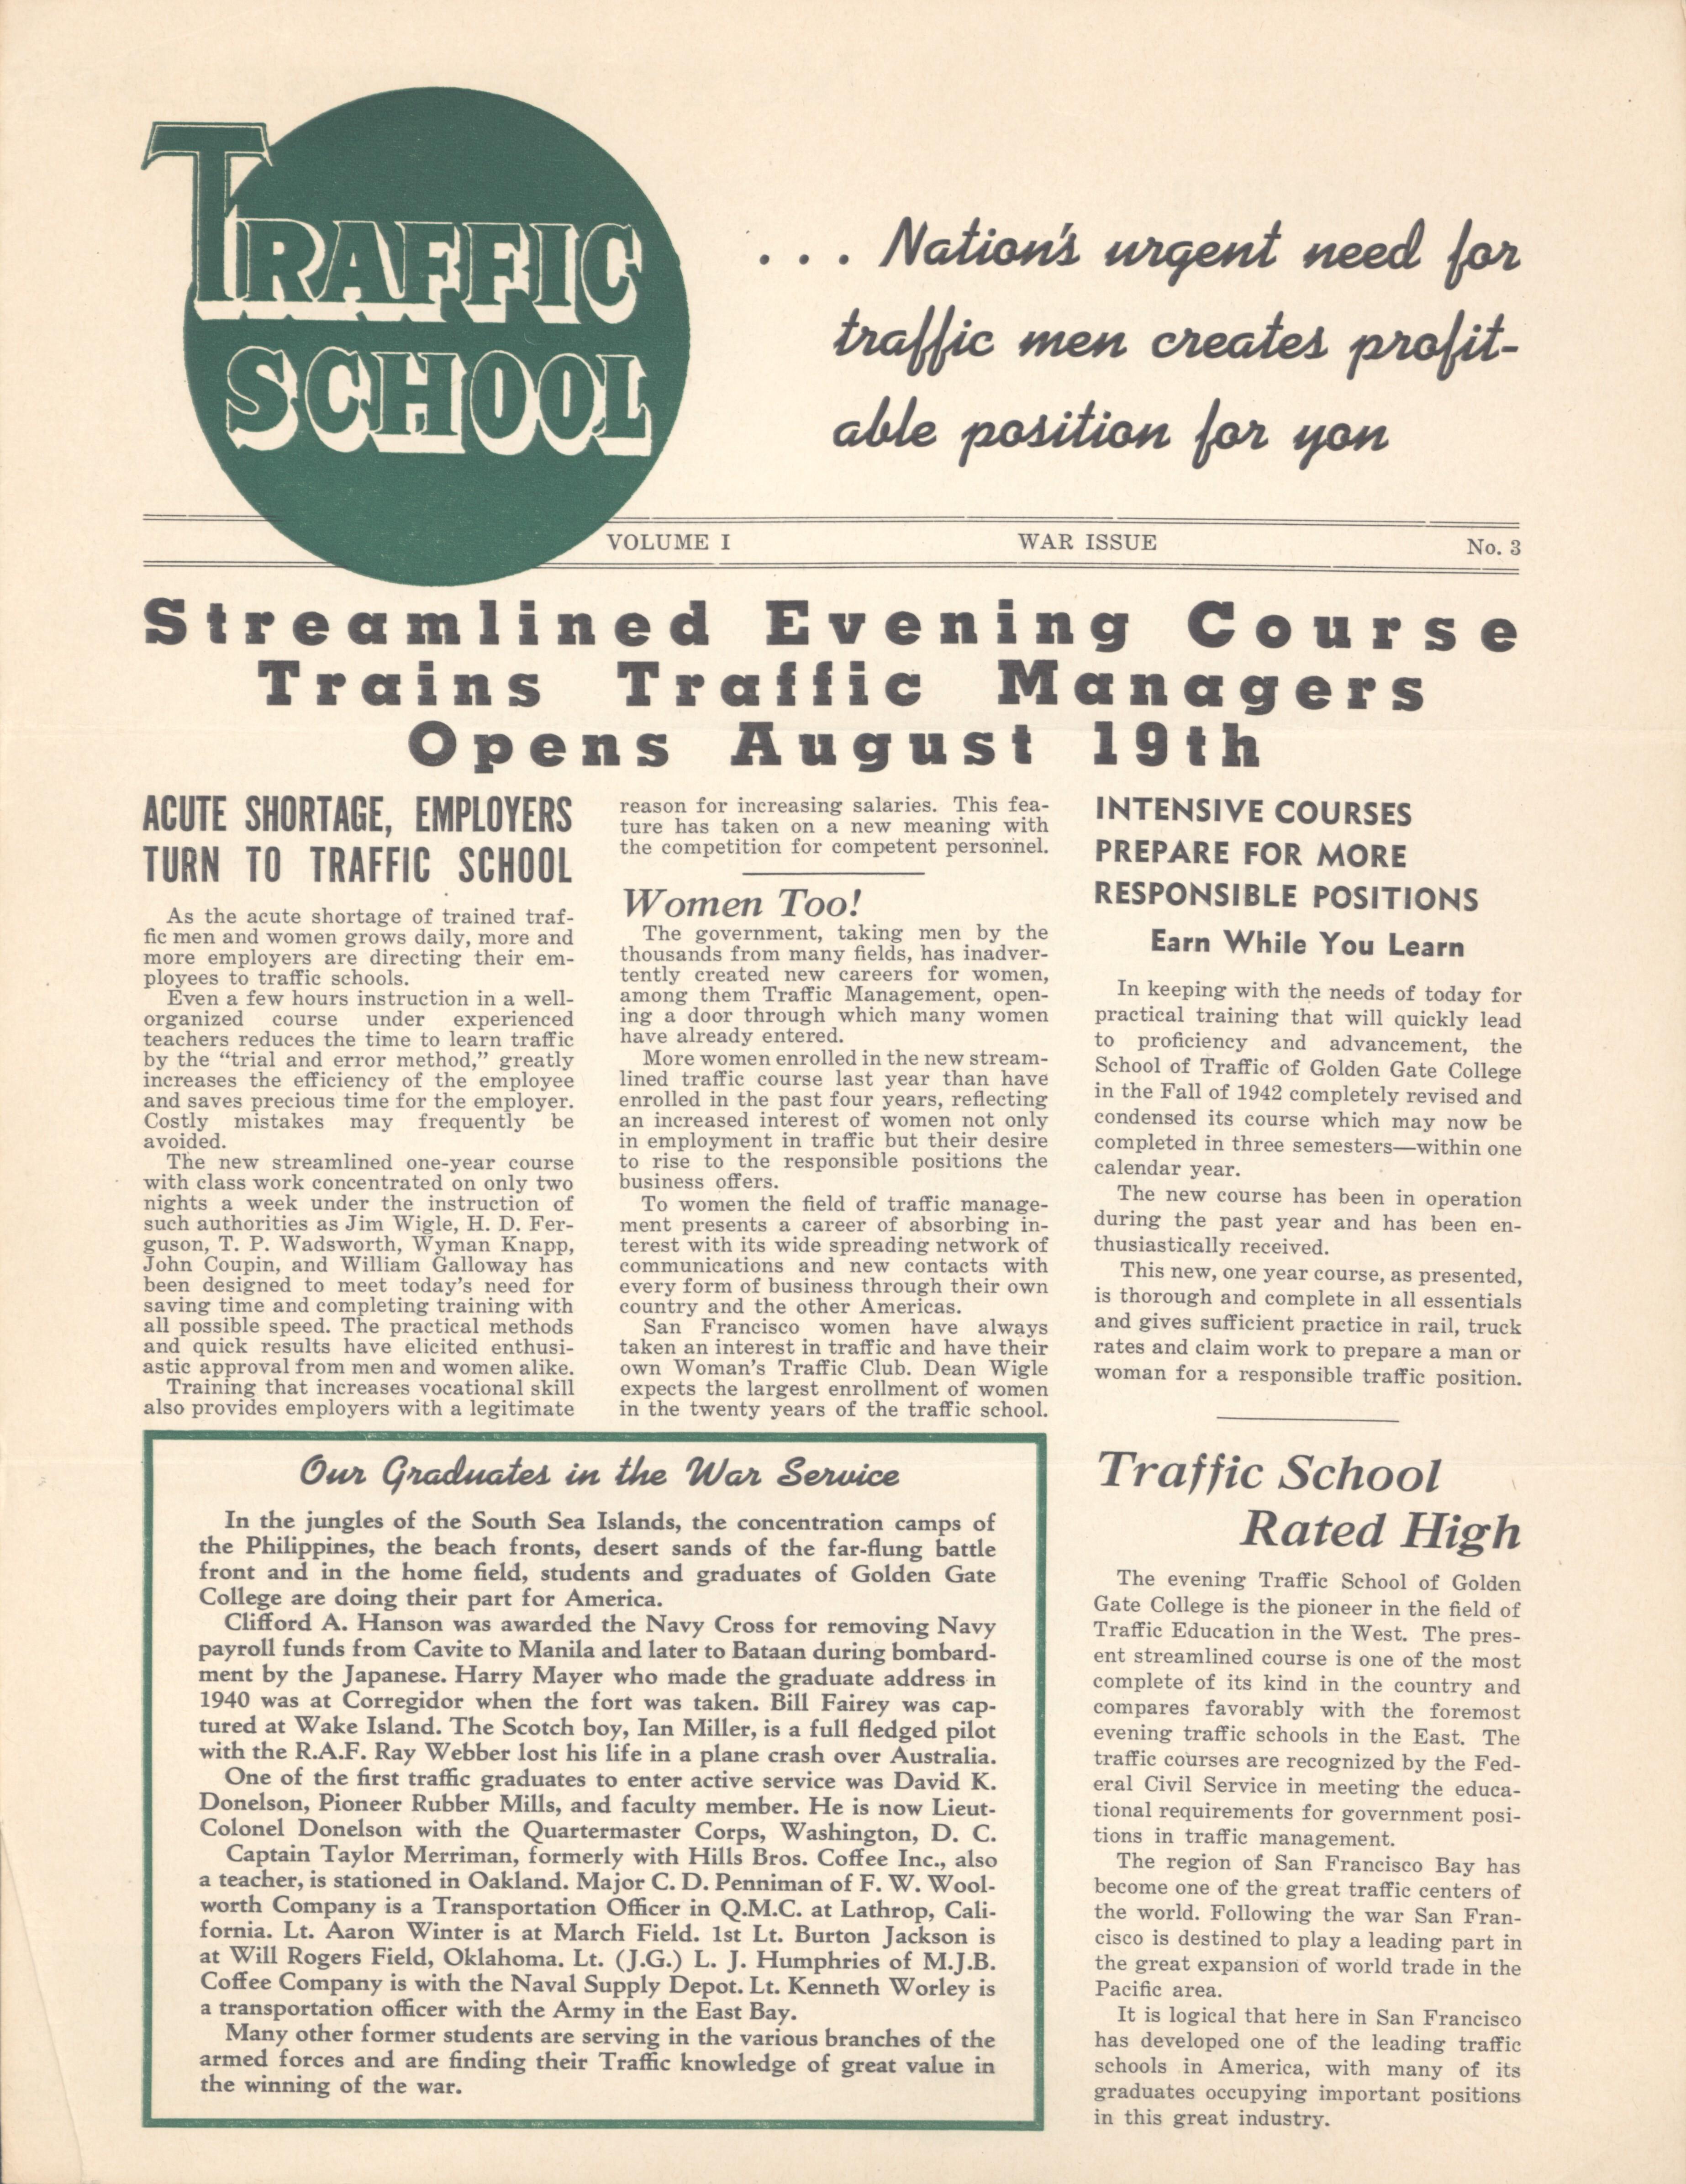 1940s WWII Era Newsletters